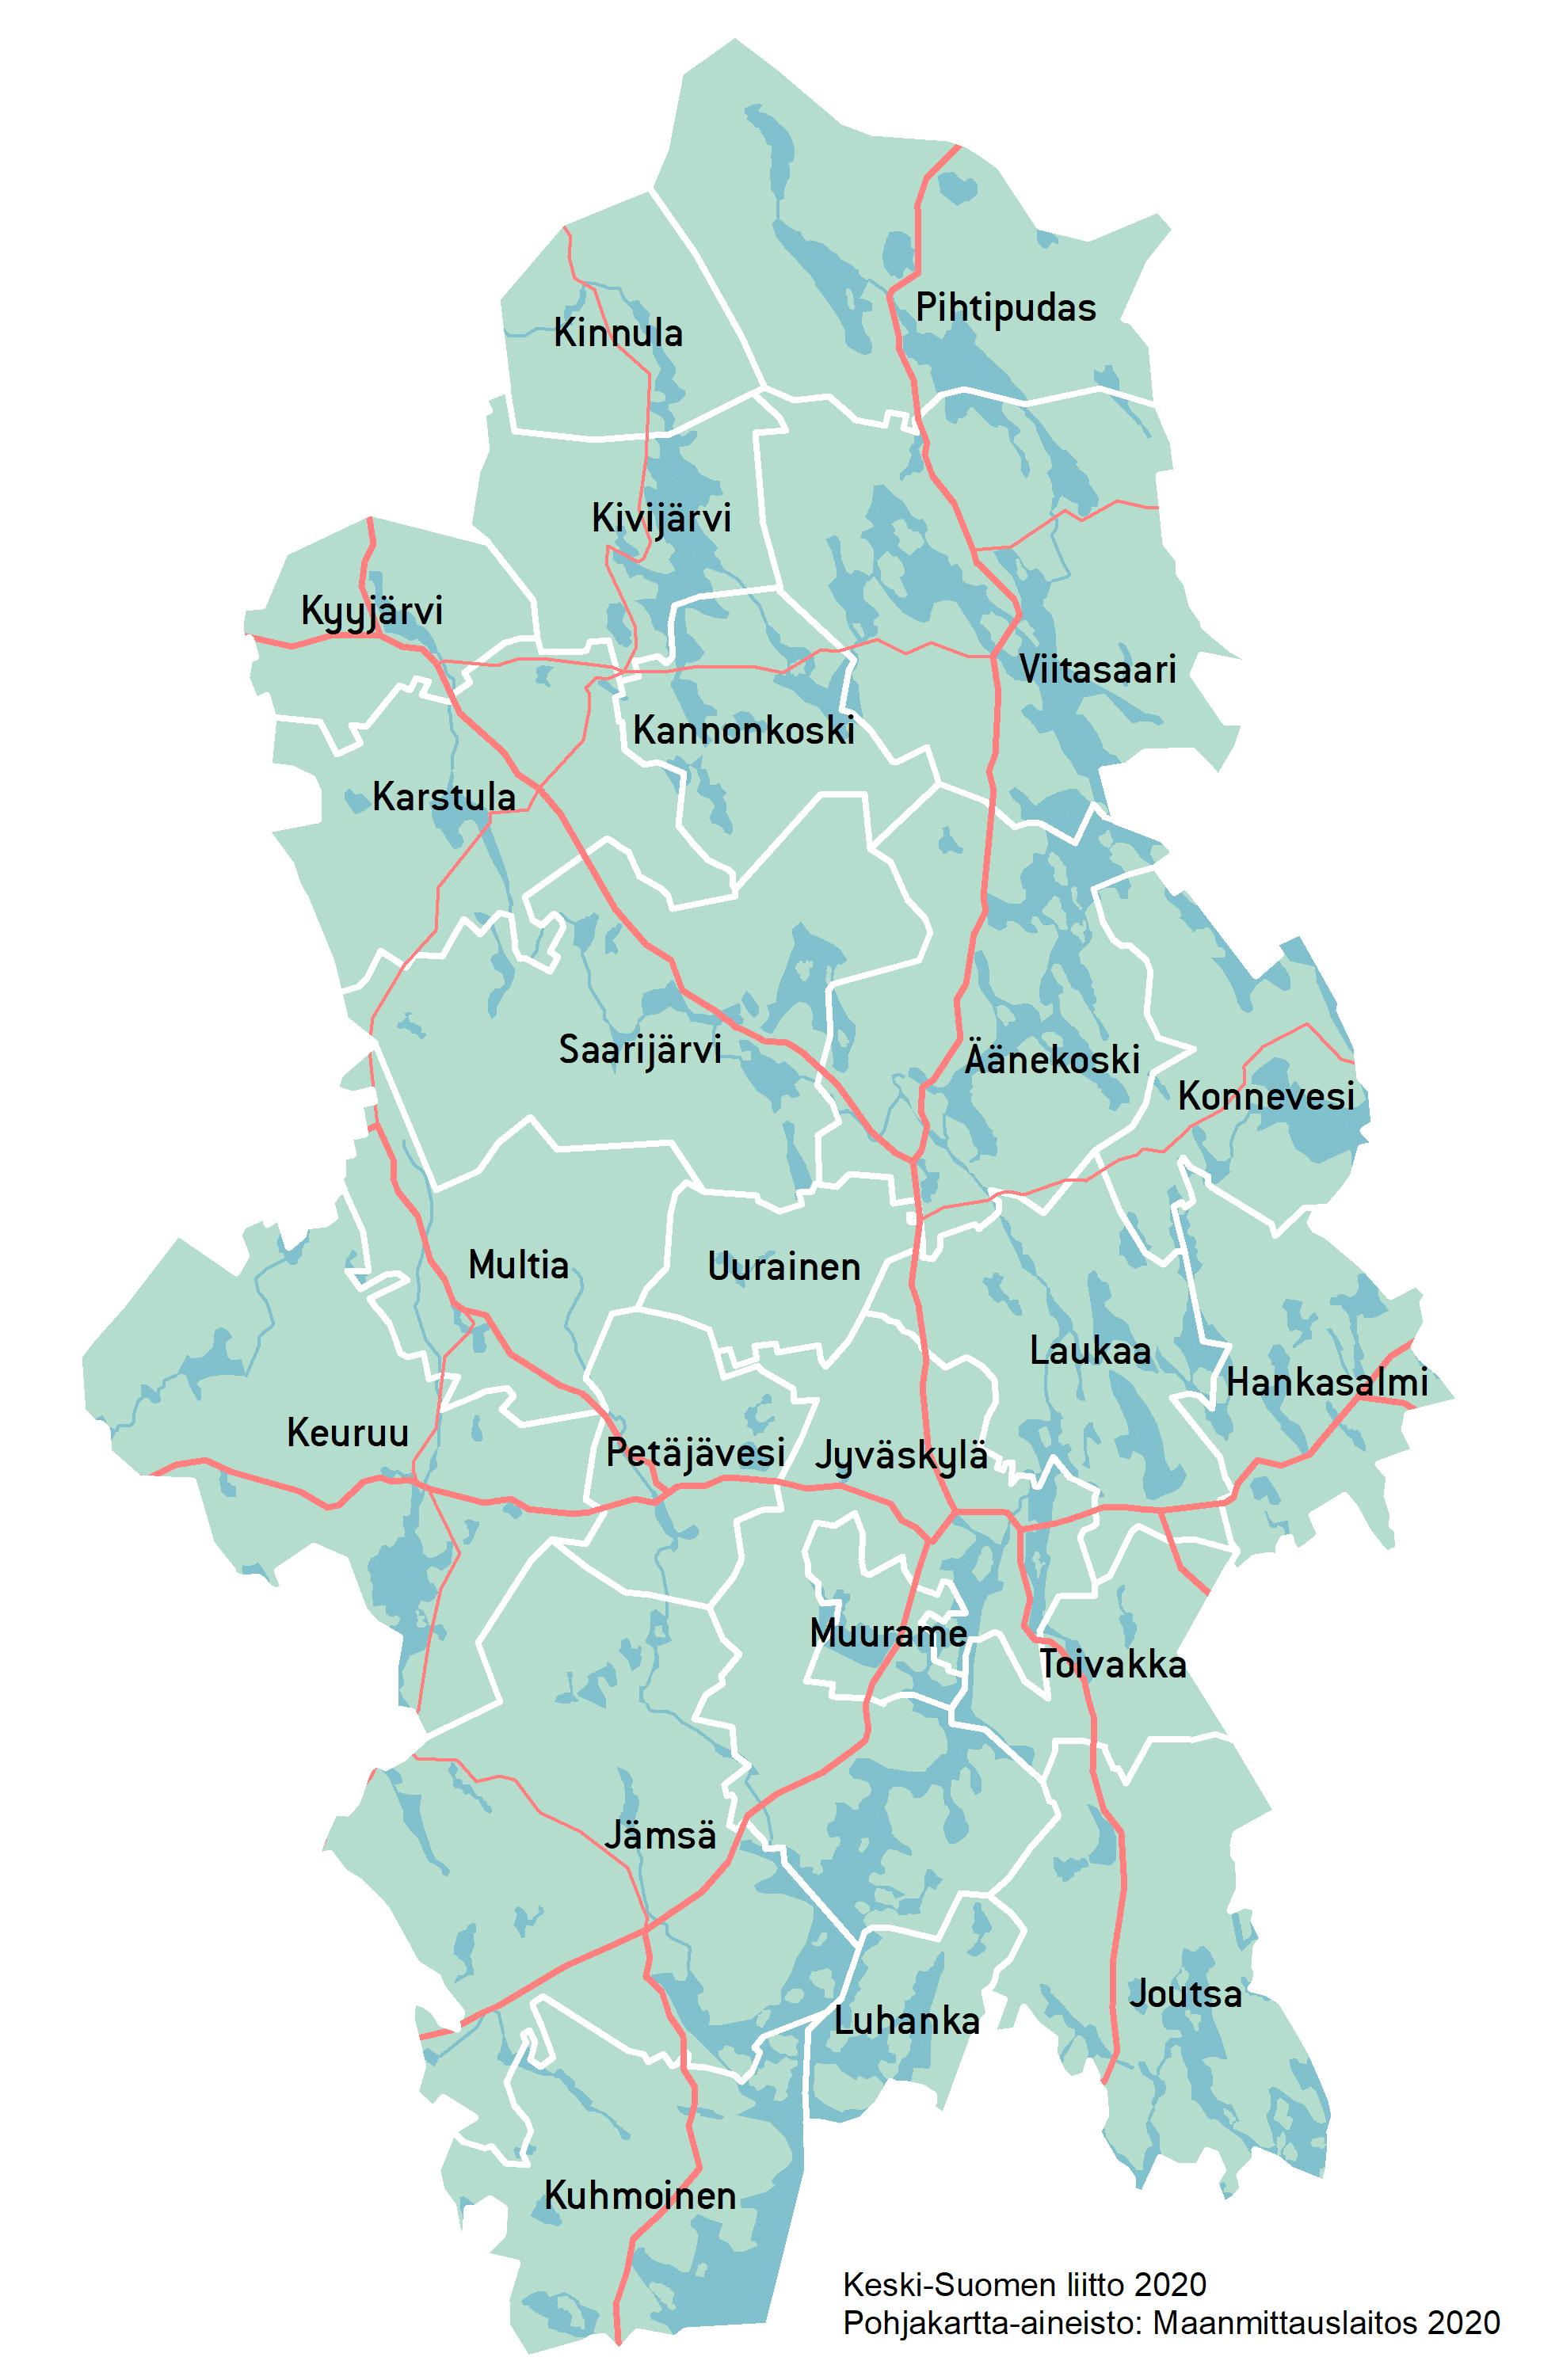 Keski-Suomen kuntakartta